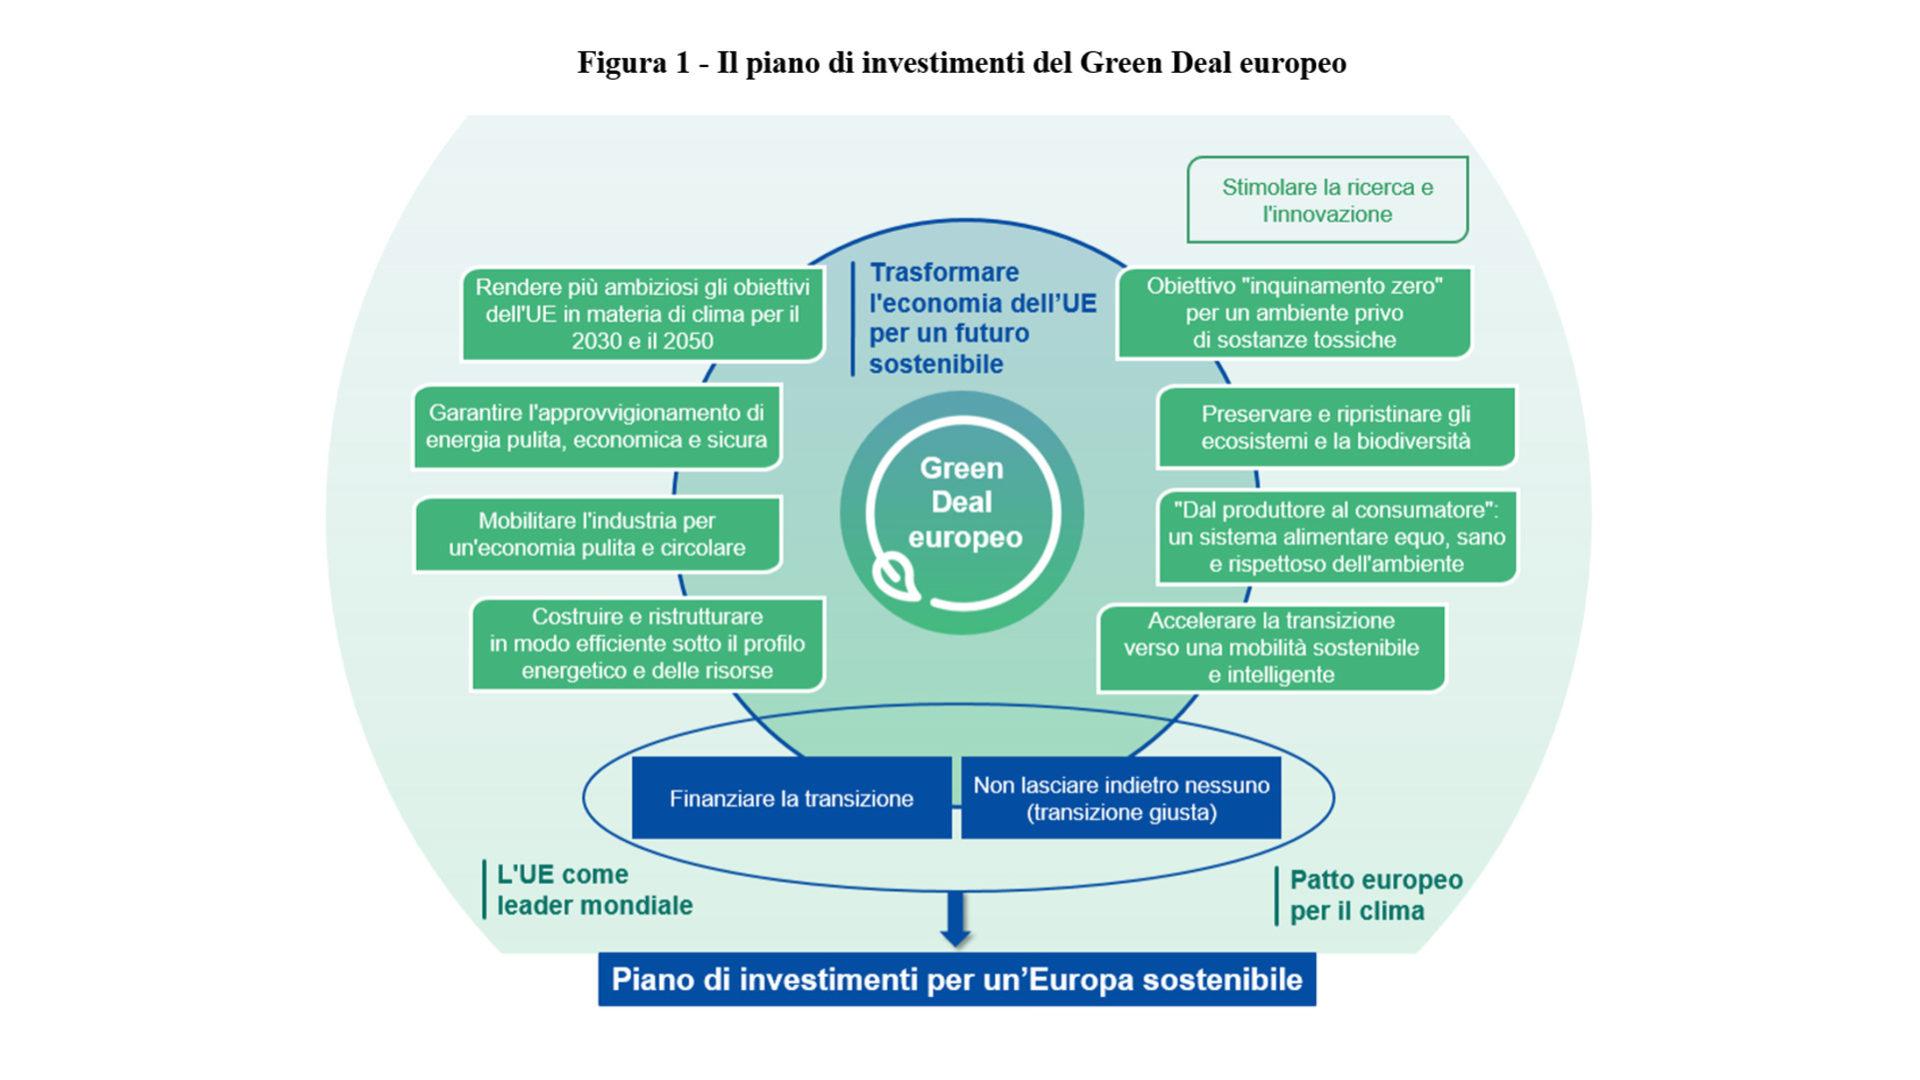 GreenDeal investimenti